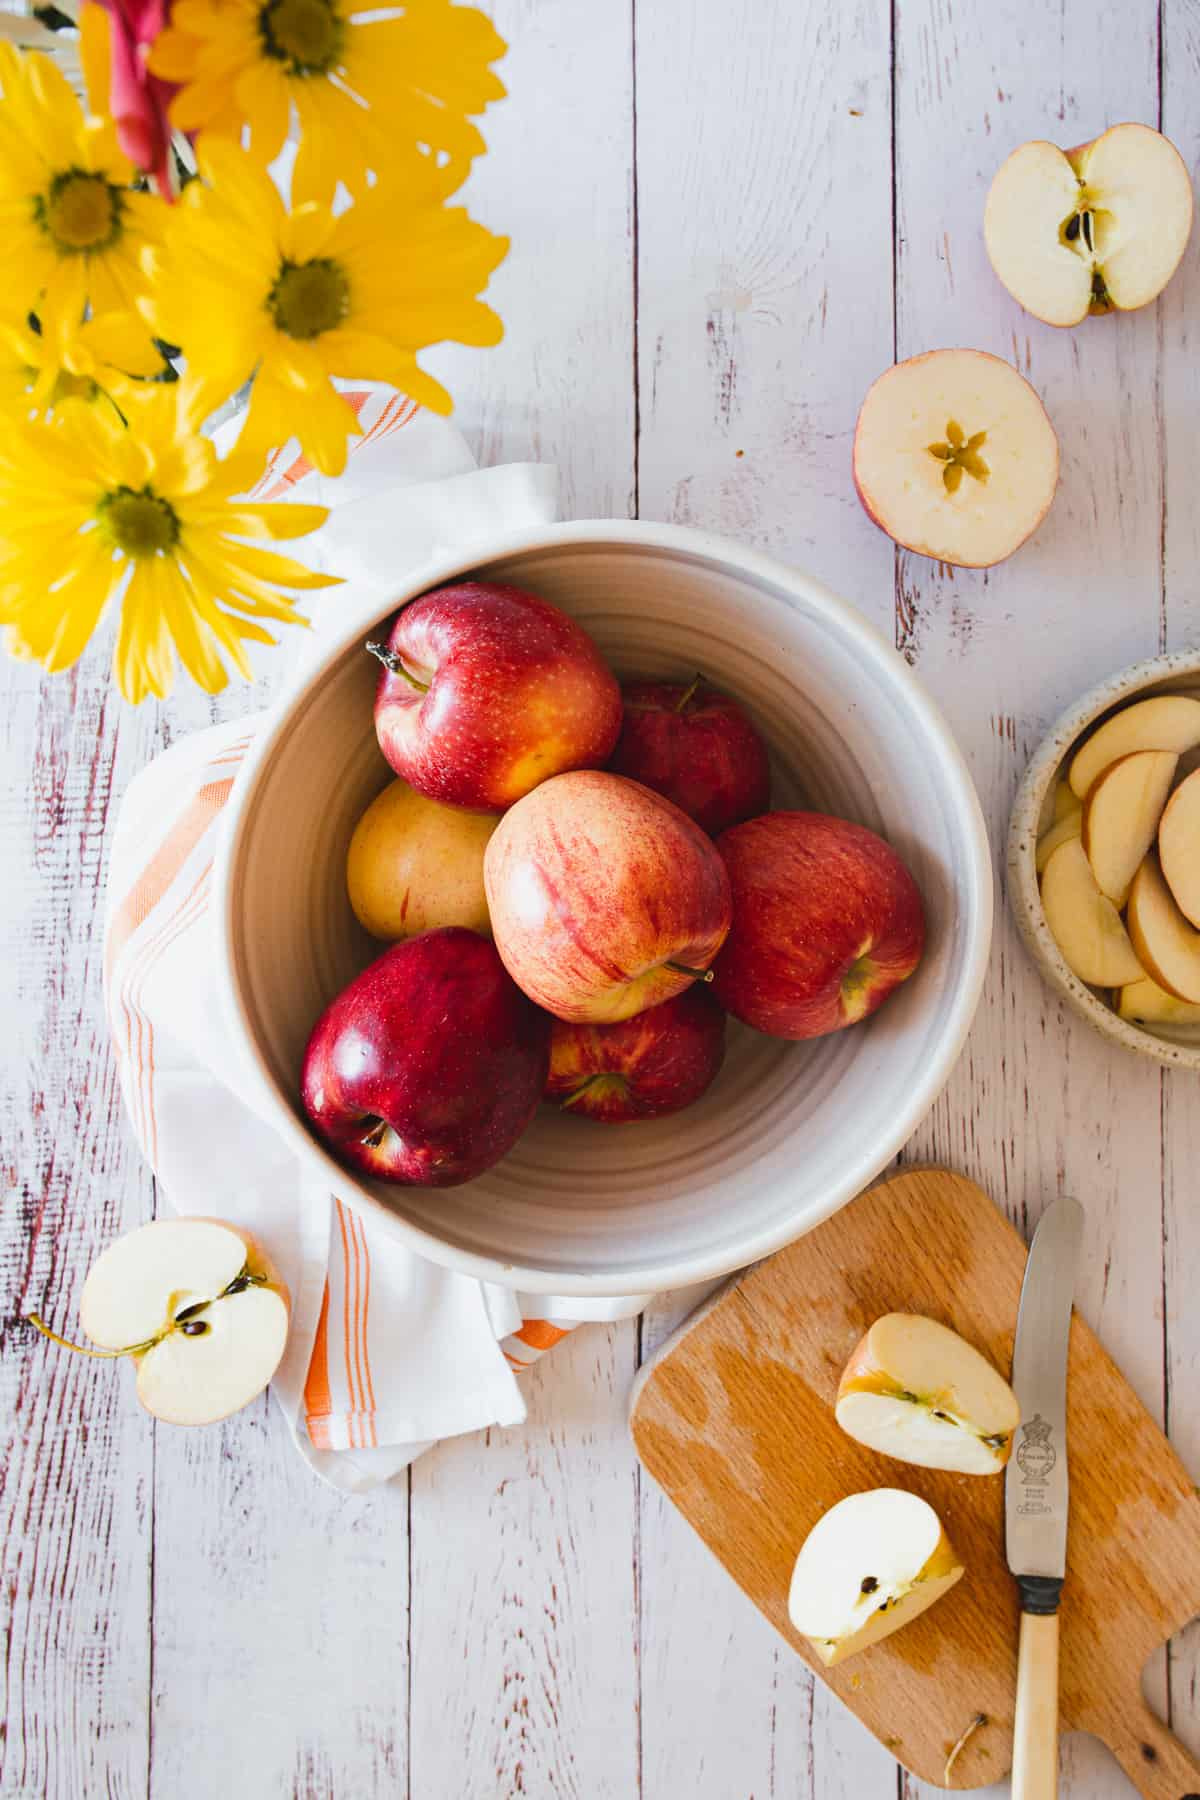 Organic Washington Gala apples